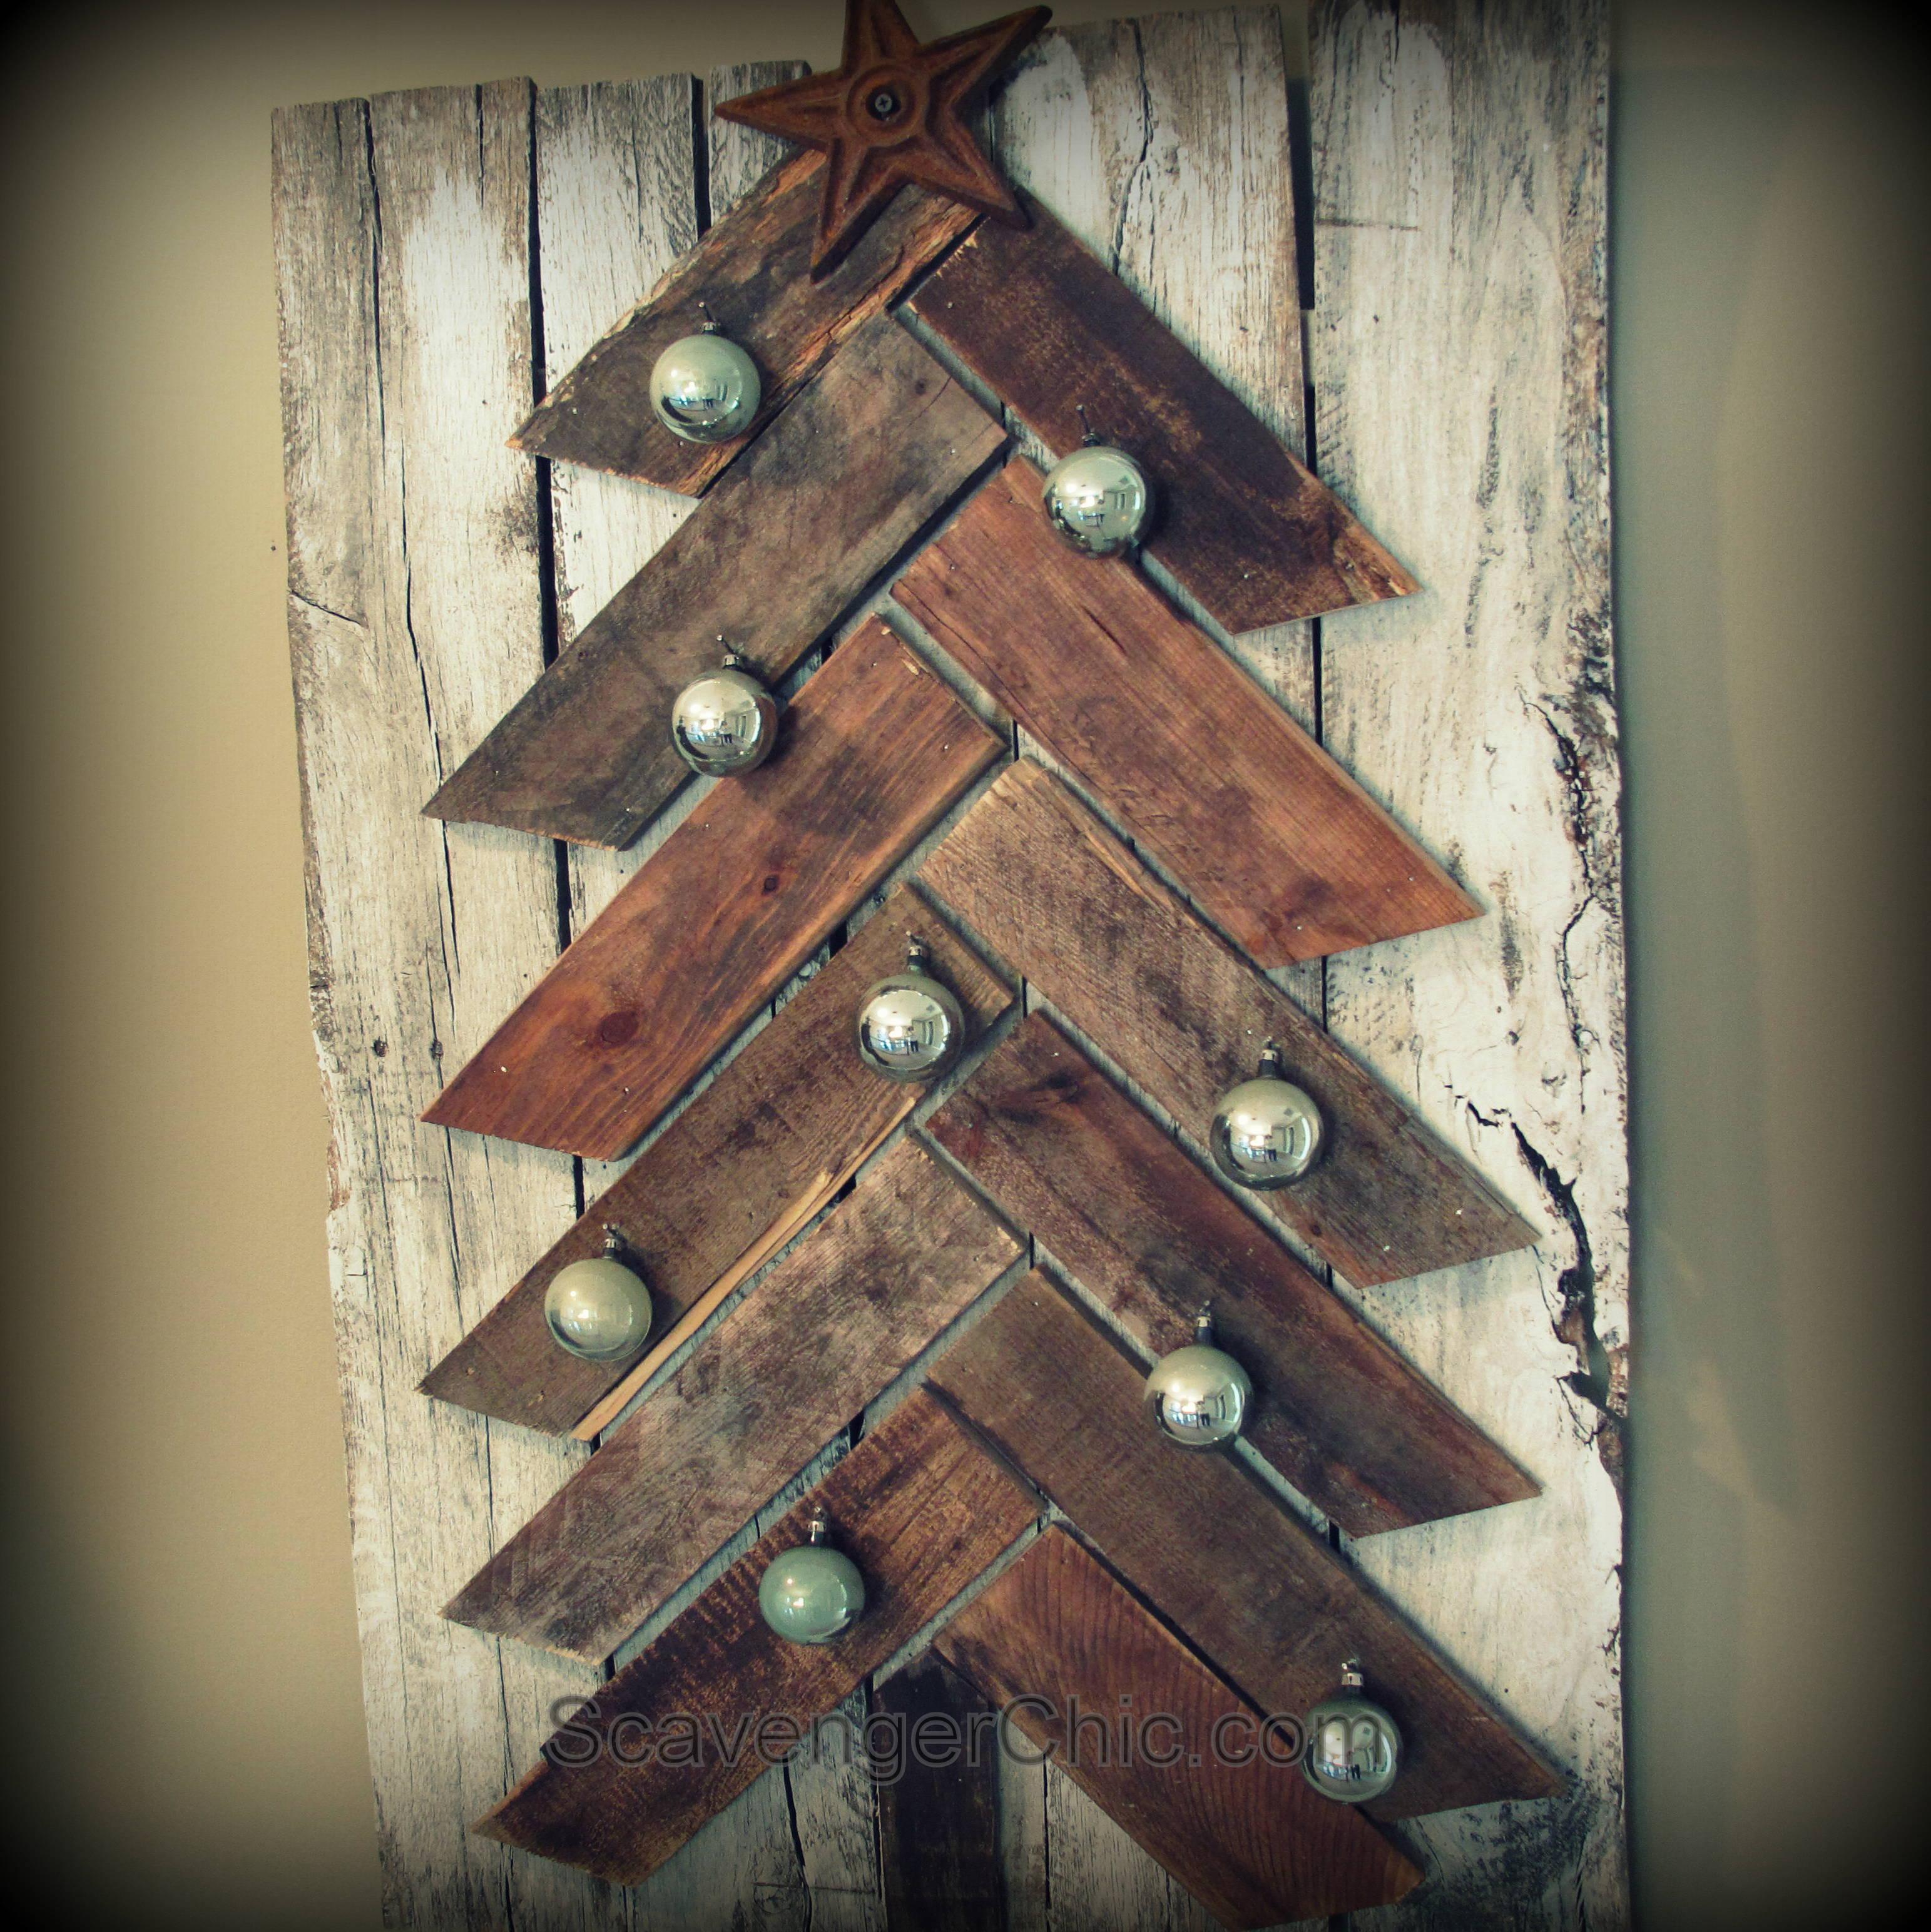 pallet wood christmas tree pallet ideas pallet projects pallet wood christmas pallet - Pallet Wood Christmas Tree